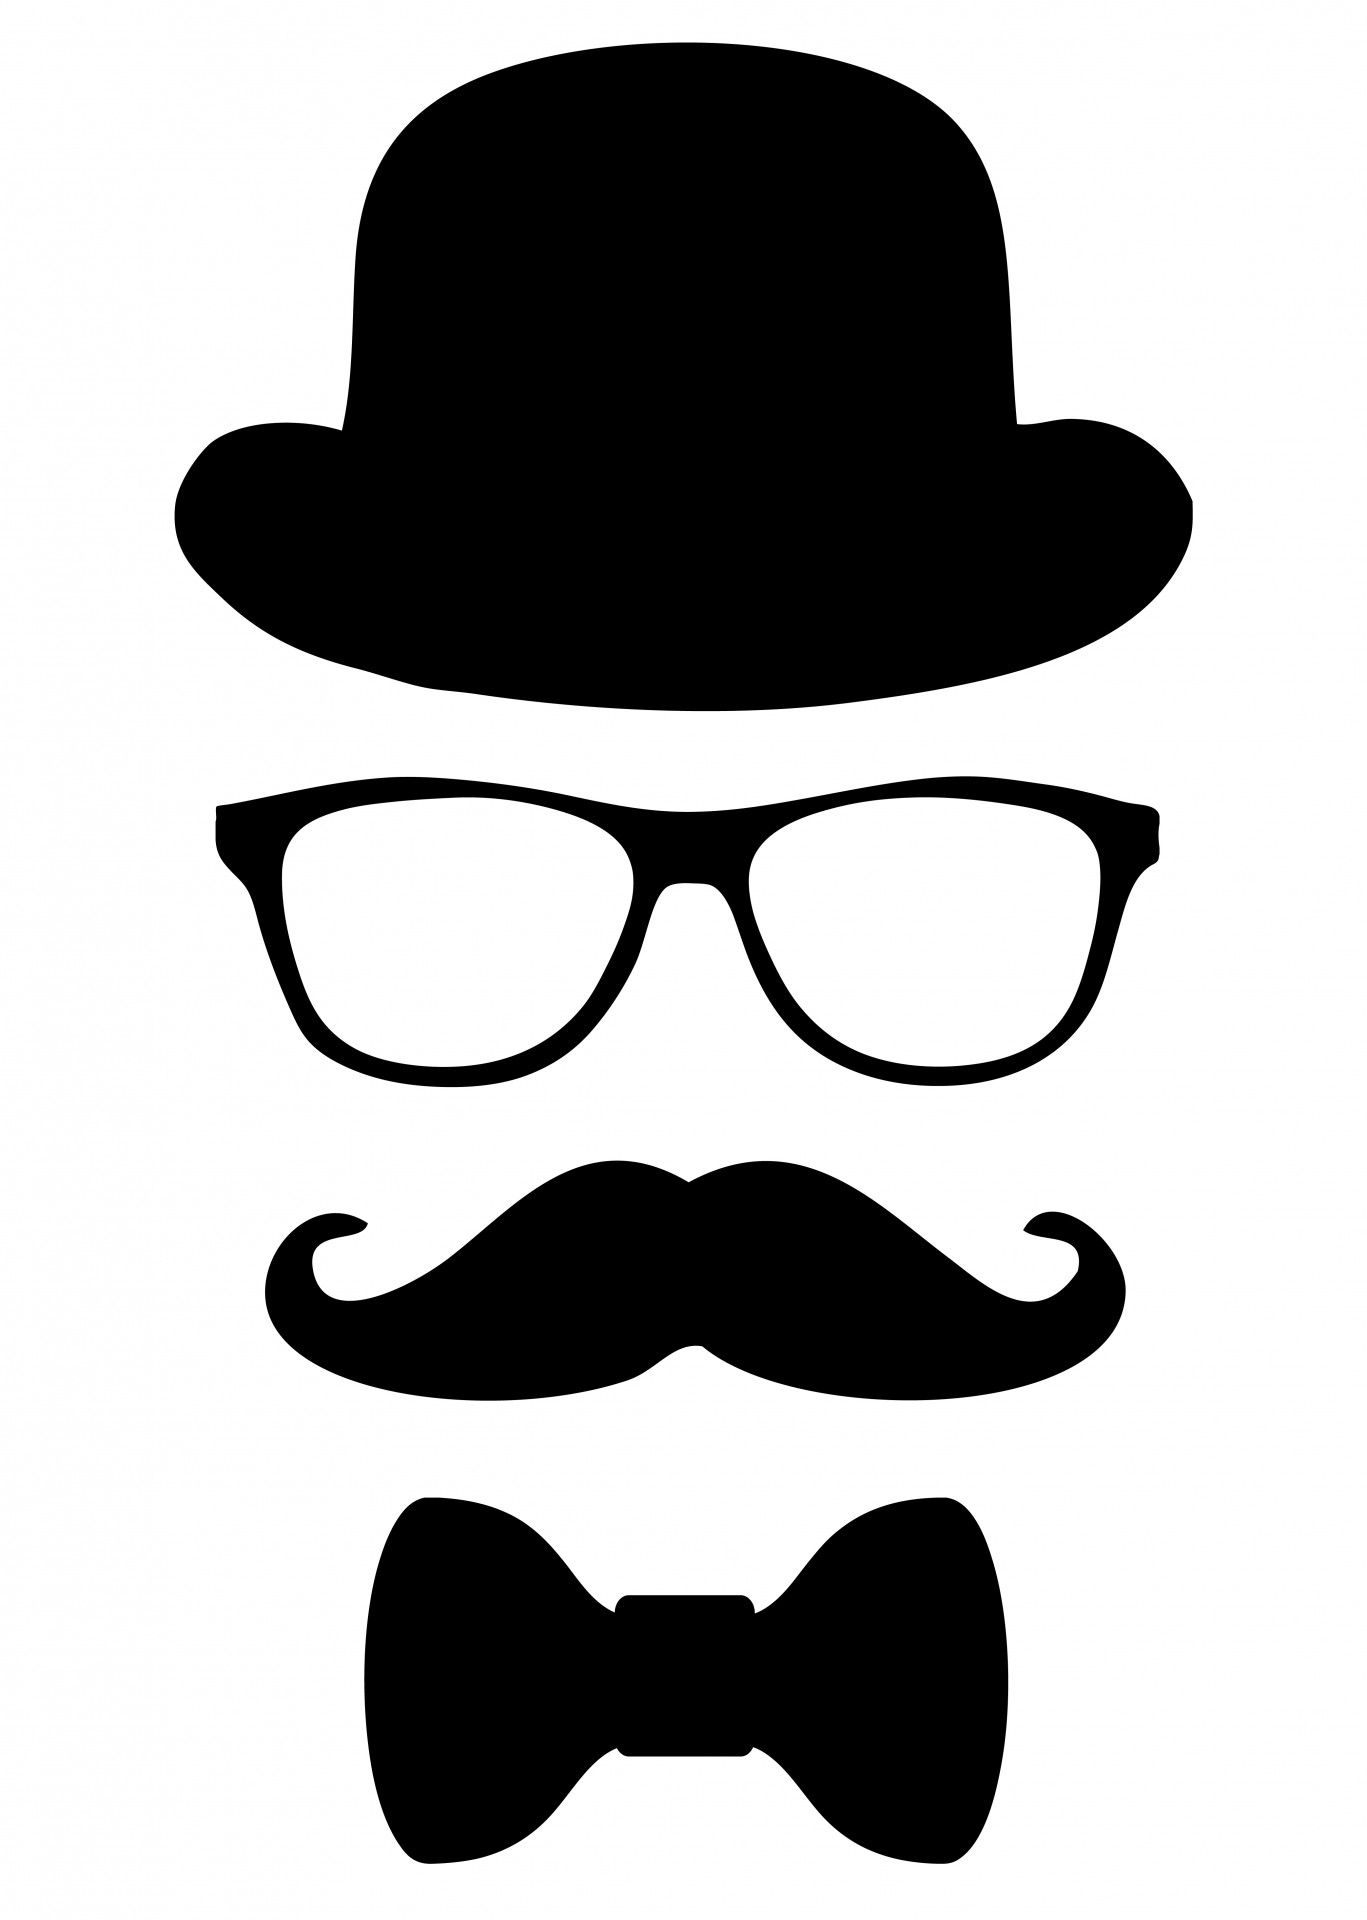 Vermomming voor de Mens Clipart   invitaciones   Pinterest ... 211dfef86a